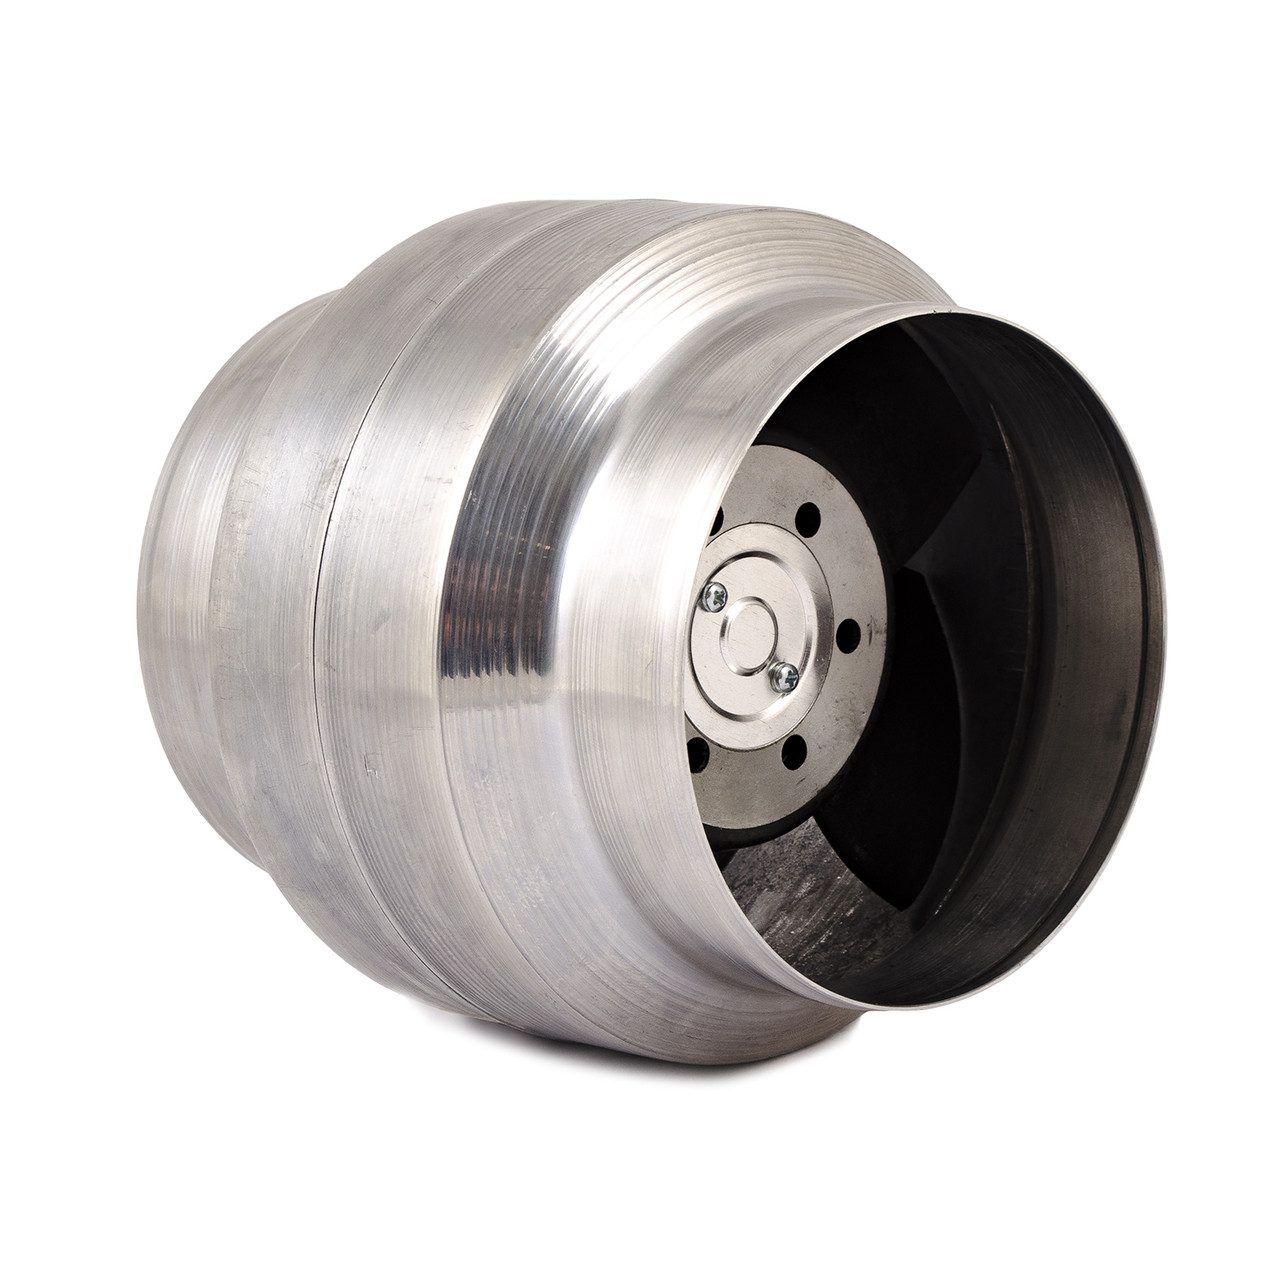 Канальний високотемпературний вентилятор MMotors VOK 120/100 (+140°C)